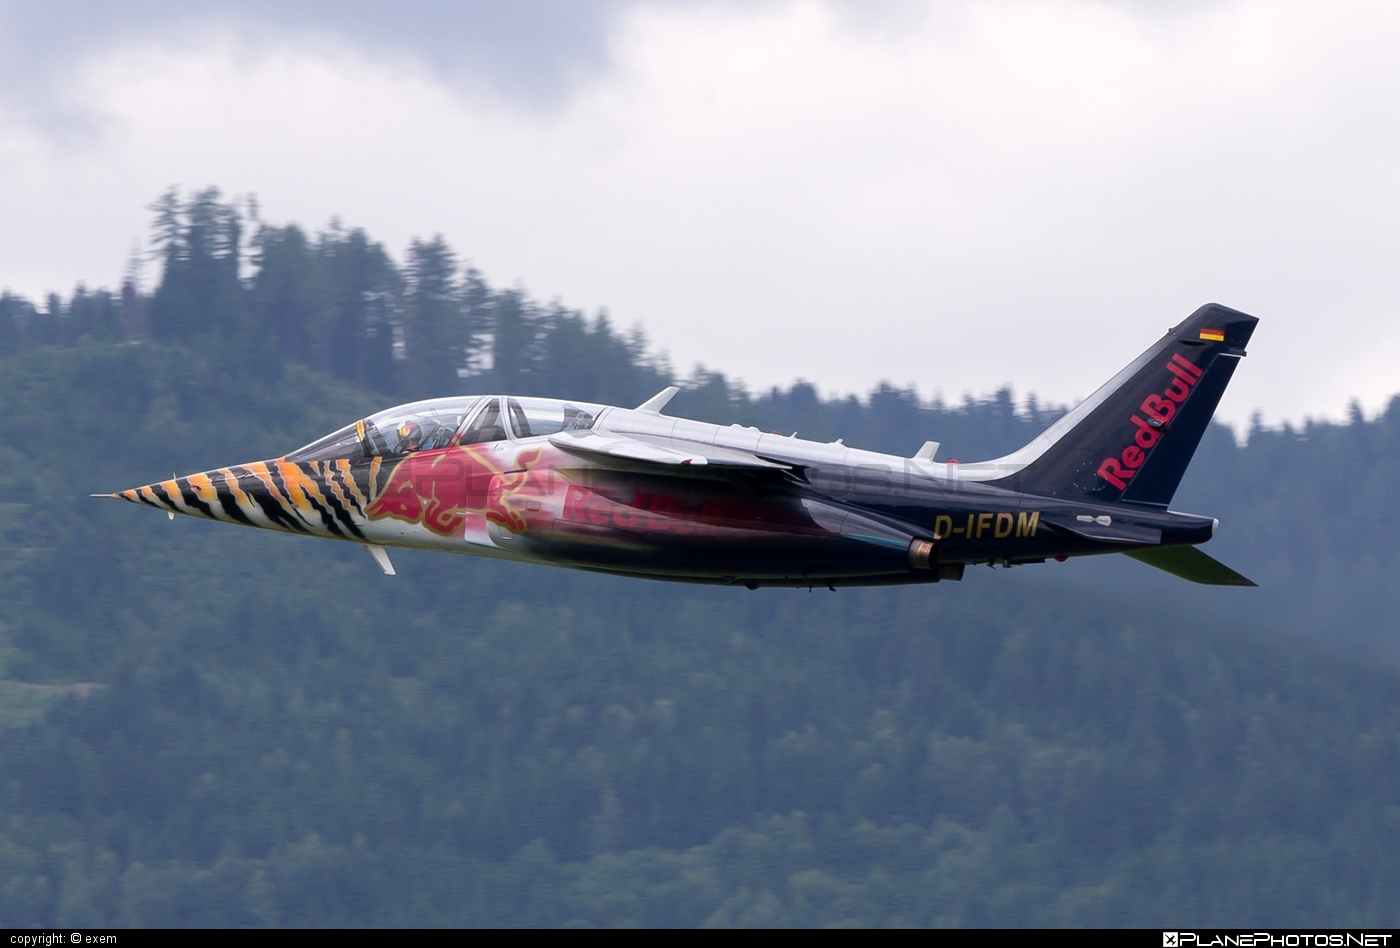 Dassault-Dornier Alpha Jet A - D-IFDM operated by The Flying Bulls #airpower #airpower2013 #alphajet #alphajeta #dassaultdornier #theflyingbulls